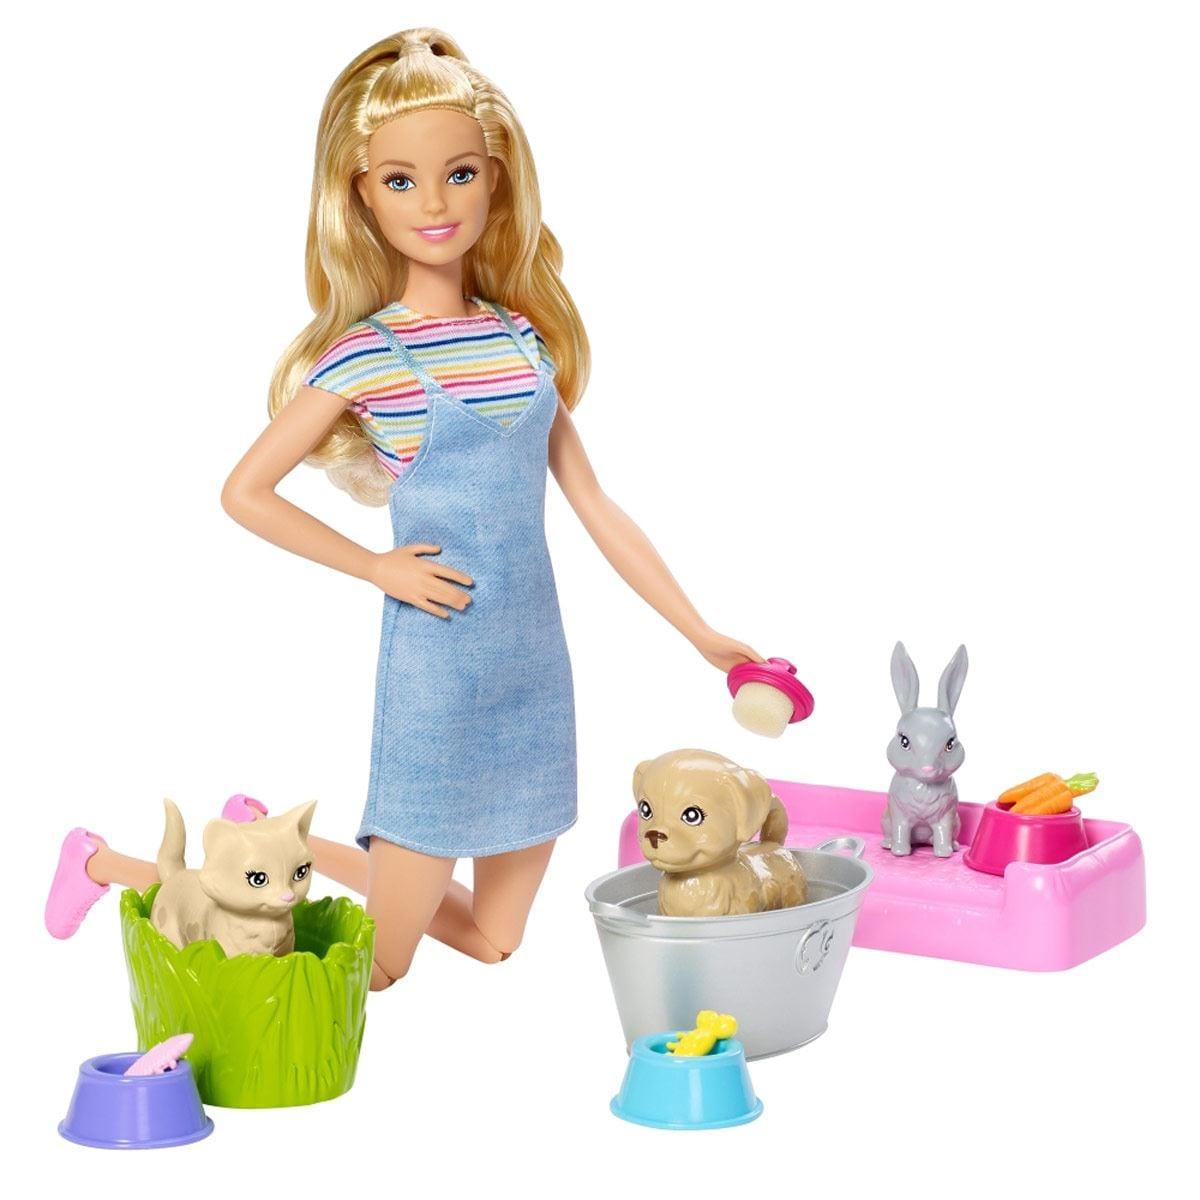 Barbie Familia Baño de Perritos